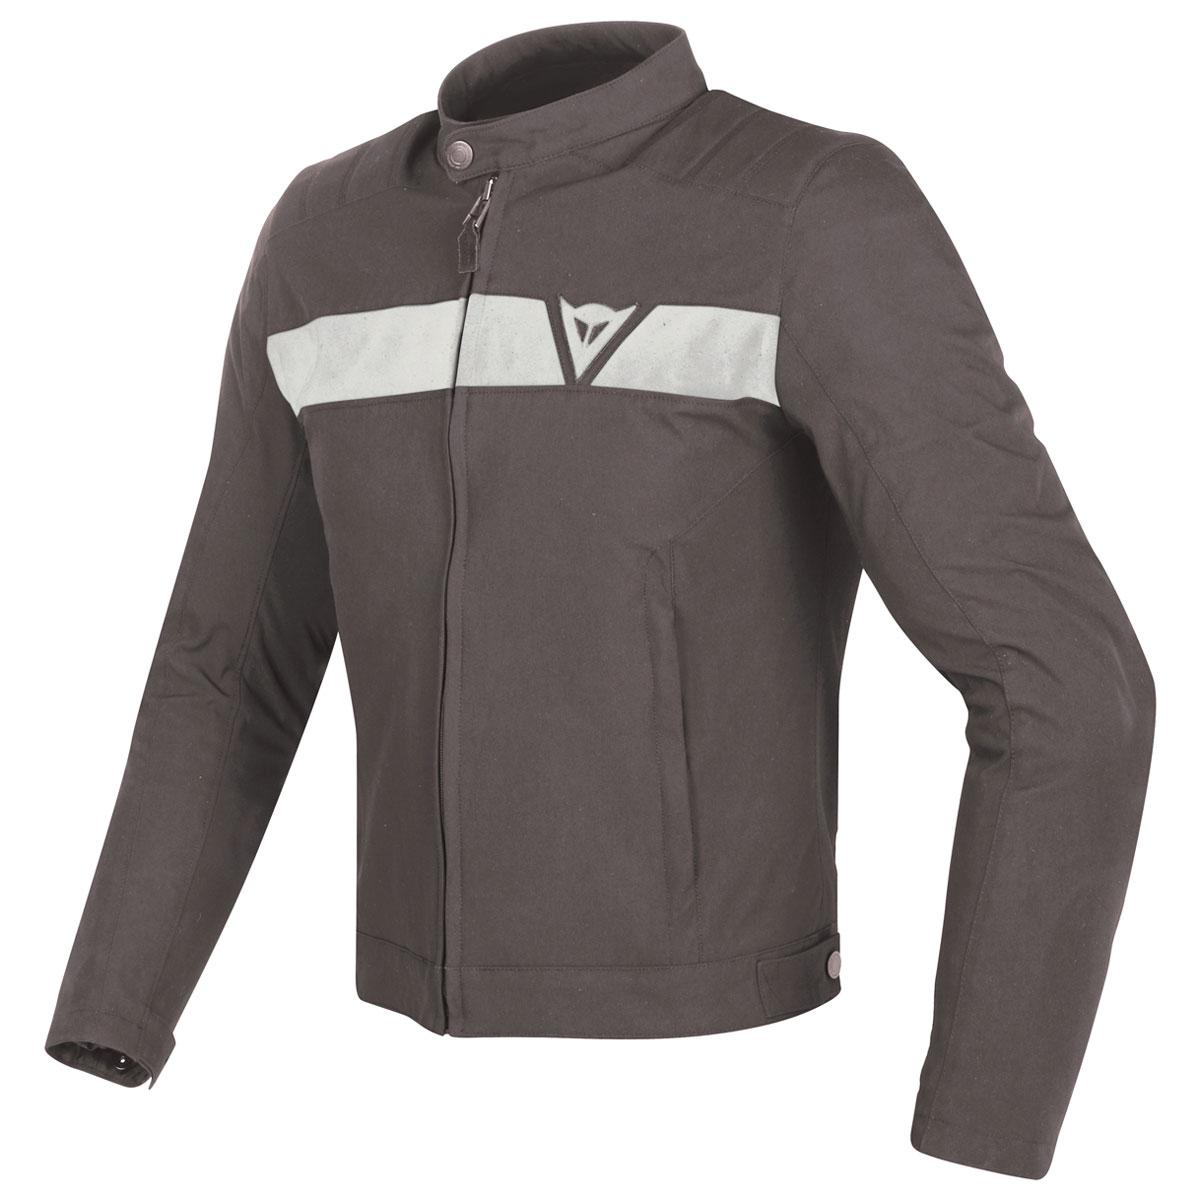 Dainese Men's Stripes Dark Brown/White Textile Jacket